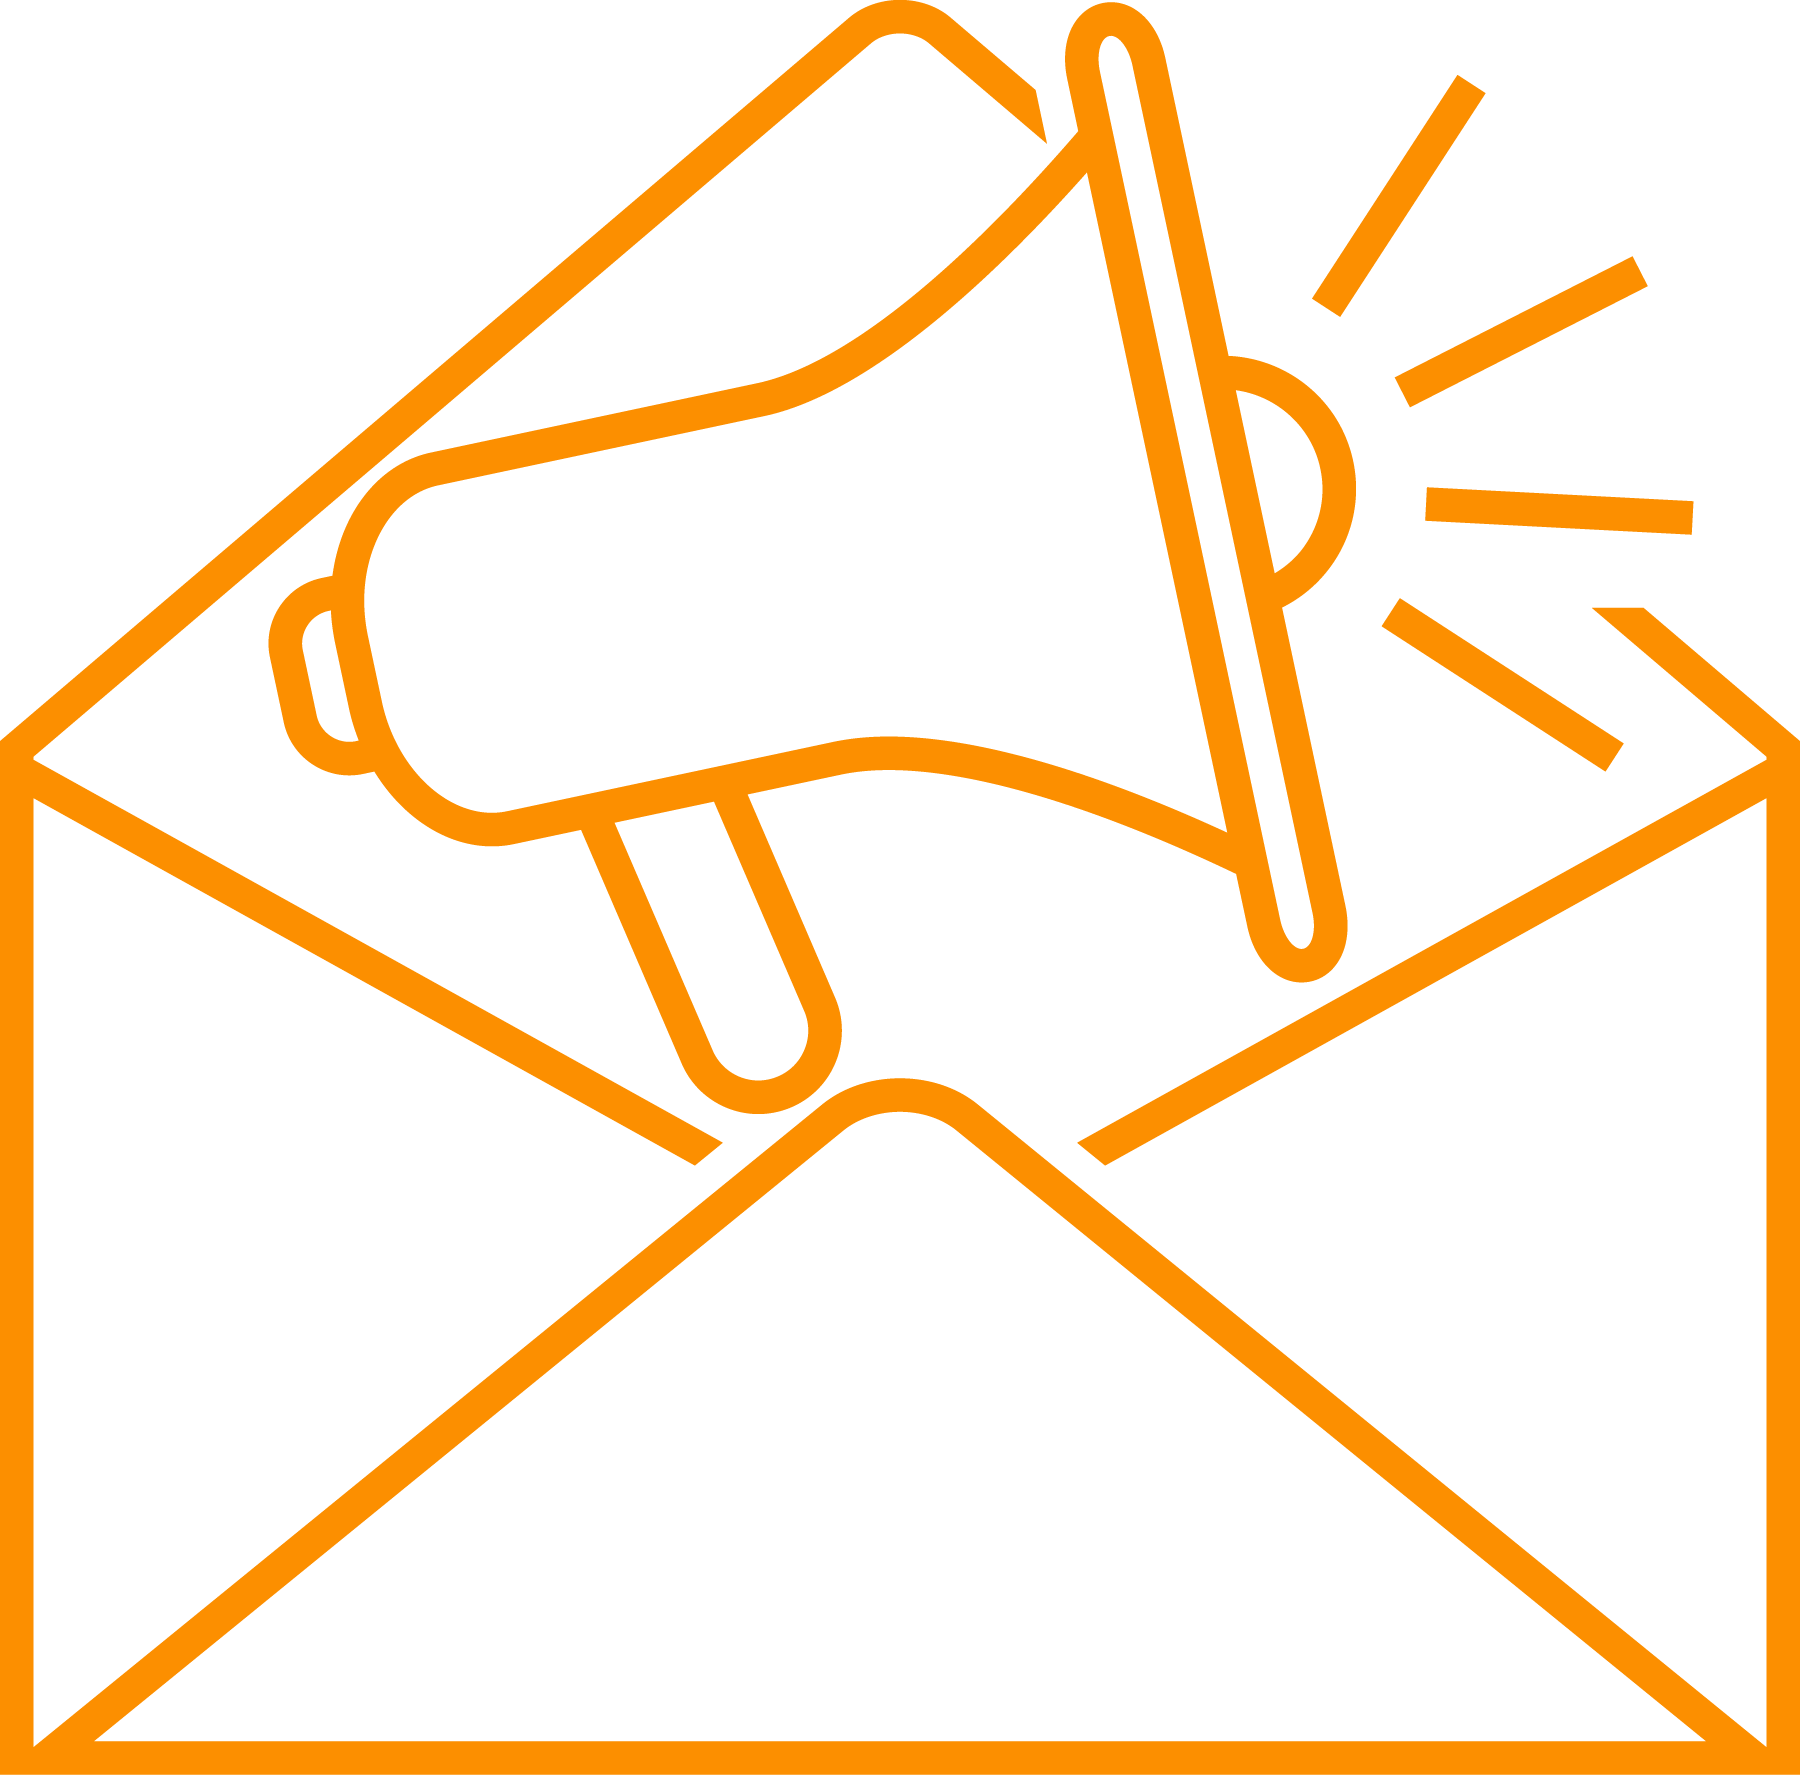 Artiklar i Falkenberg-Kattegatt Rotaryklubb